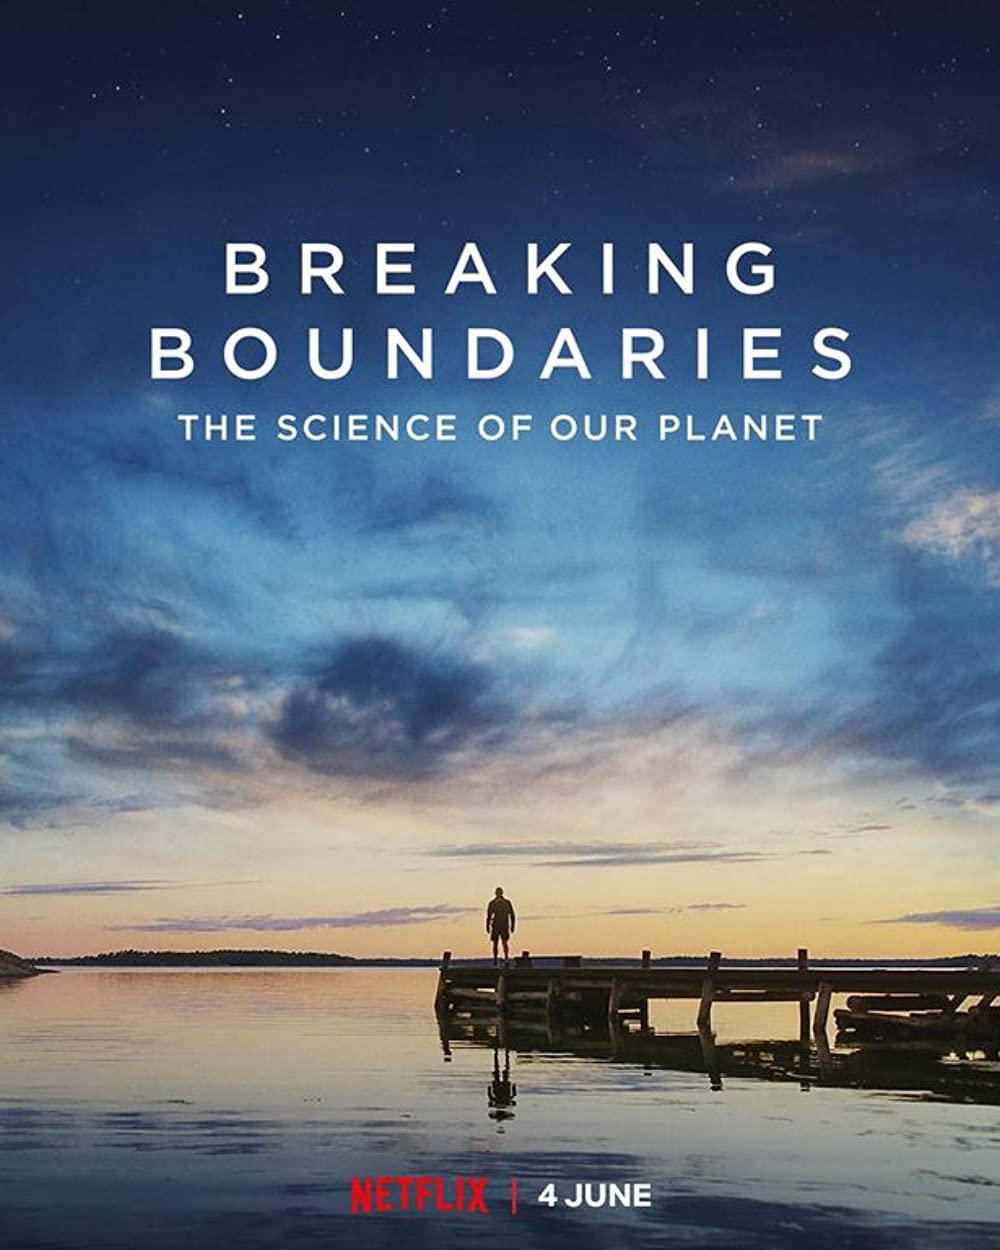 breakingboundaries